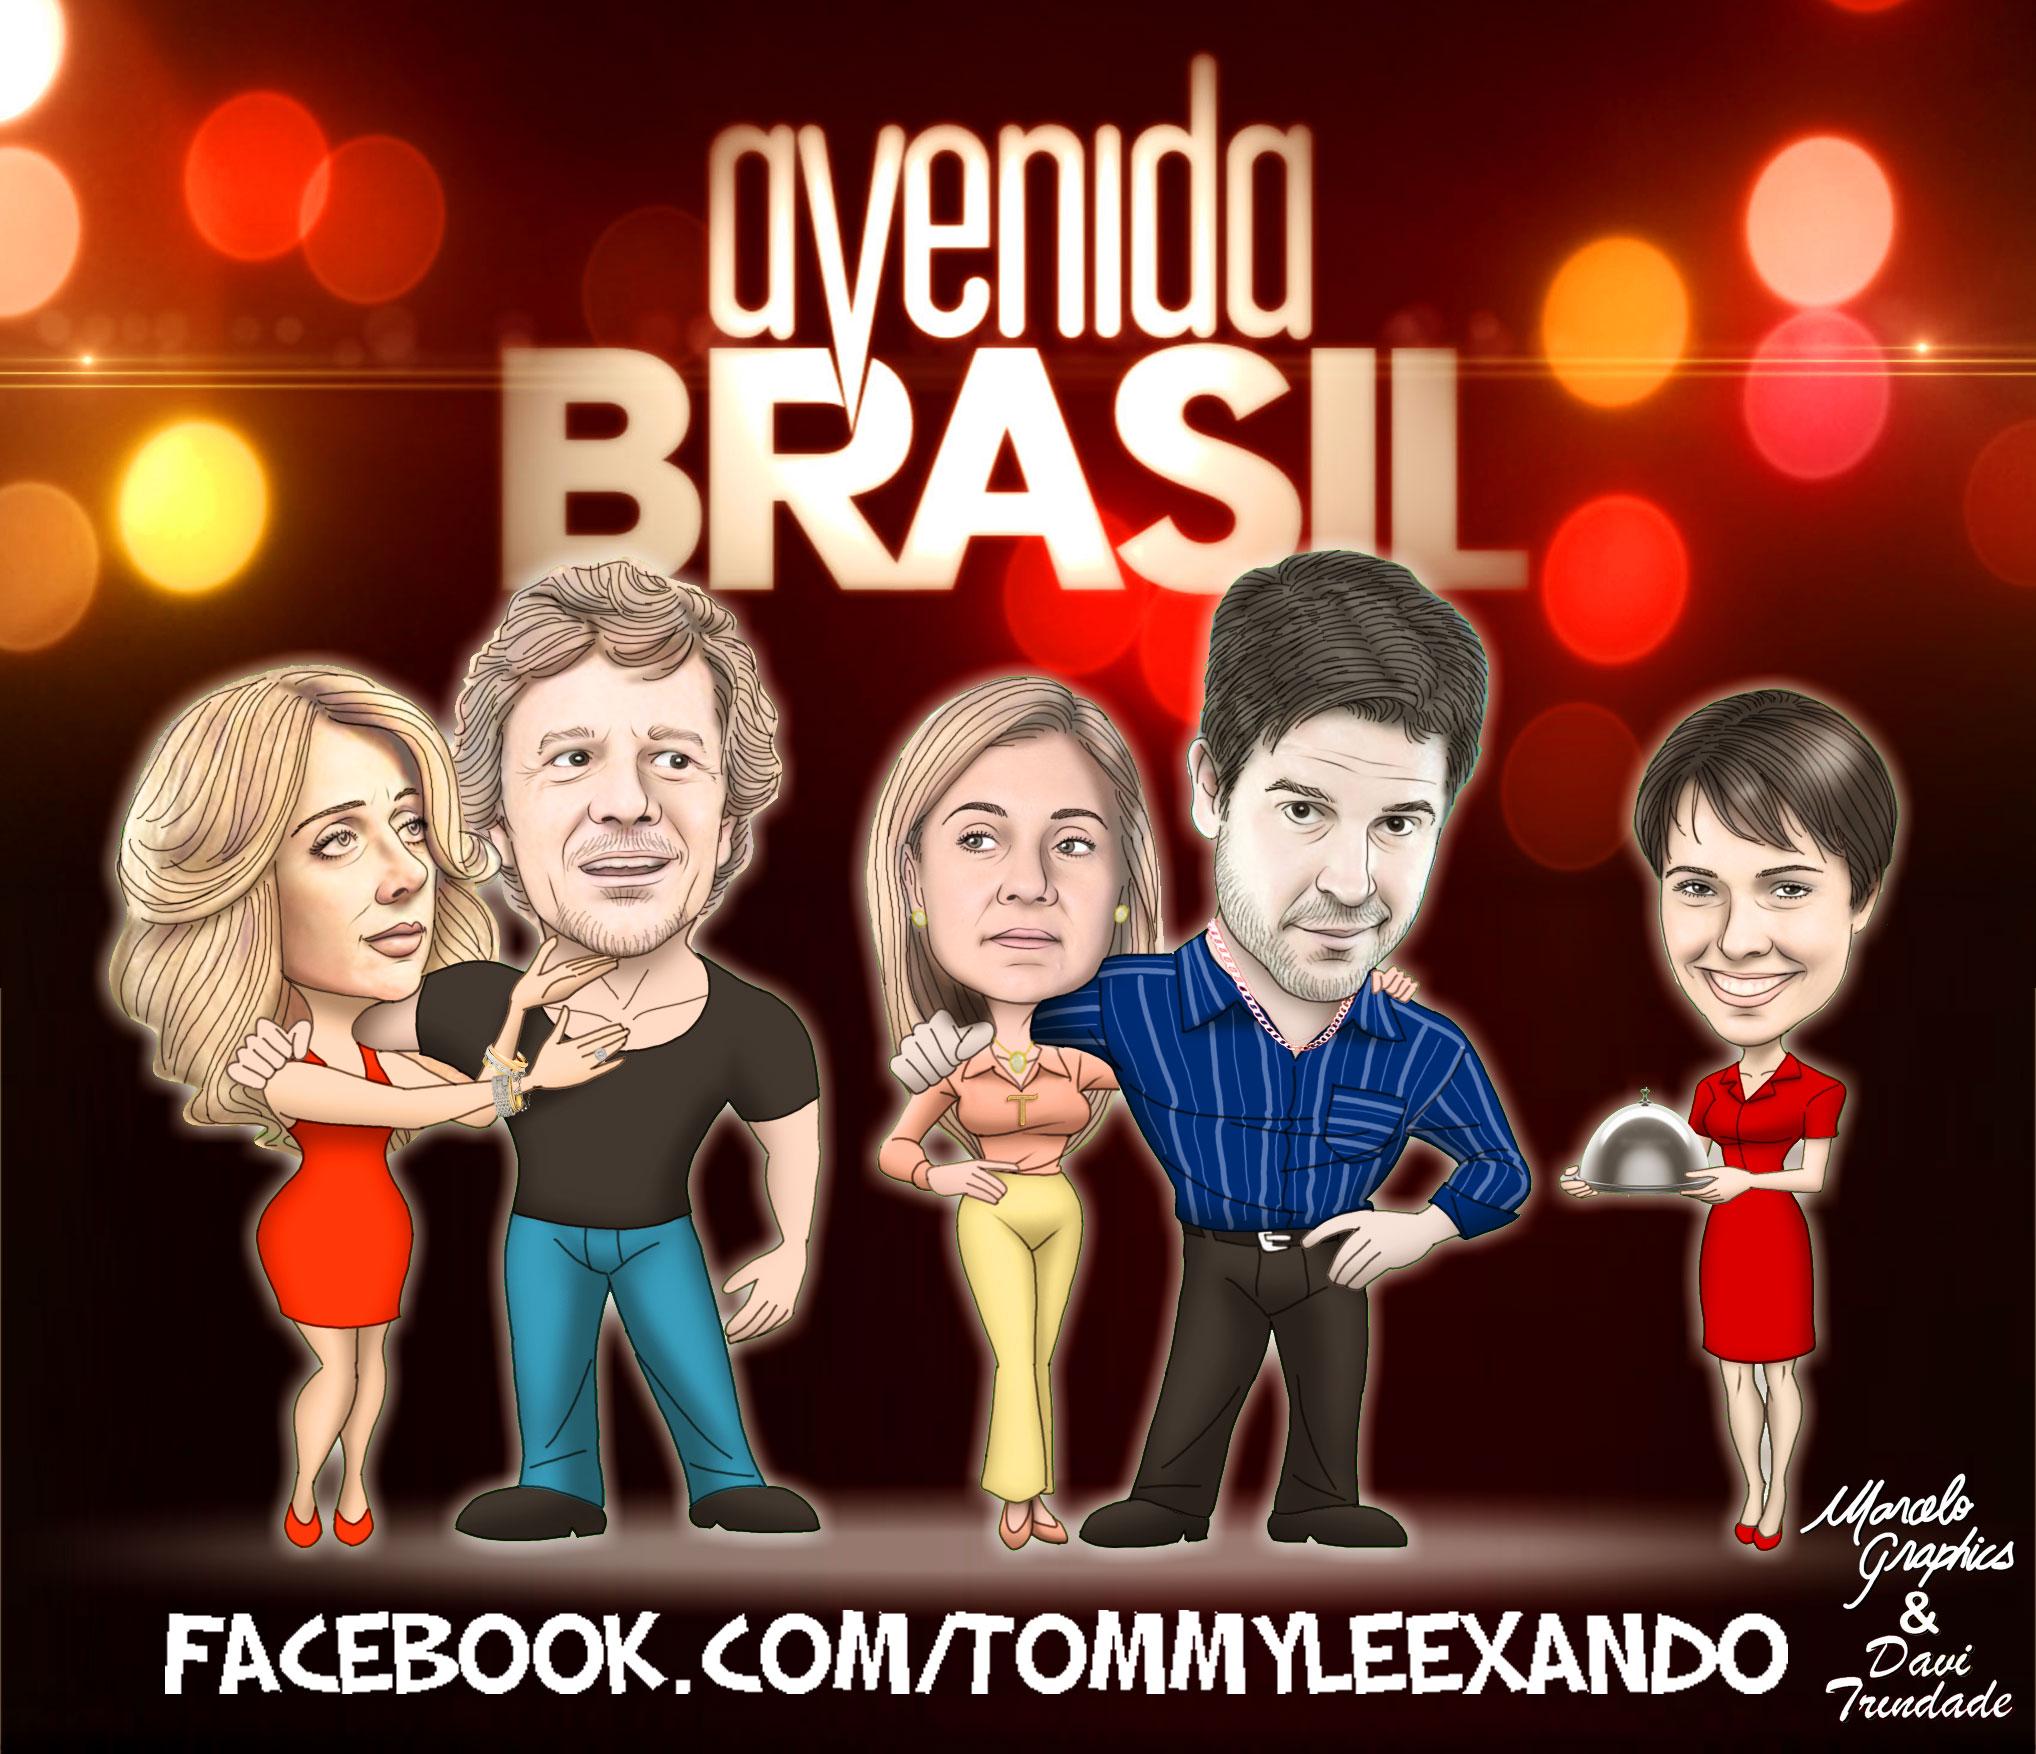 Caricaturas de Avenida Brasil